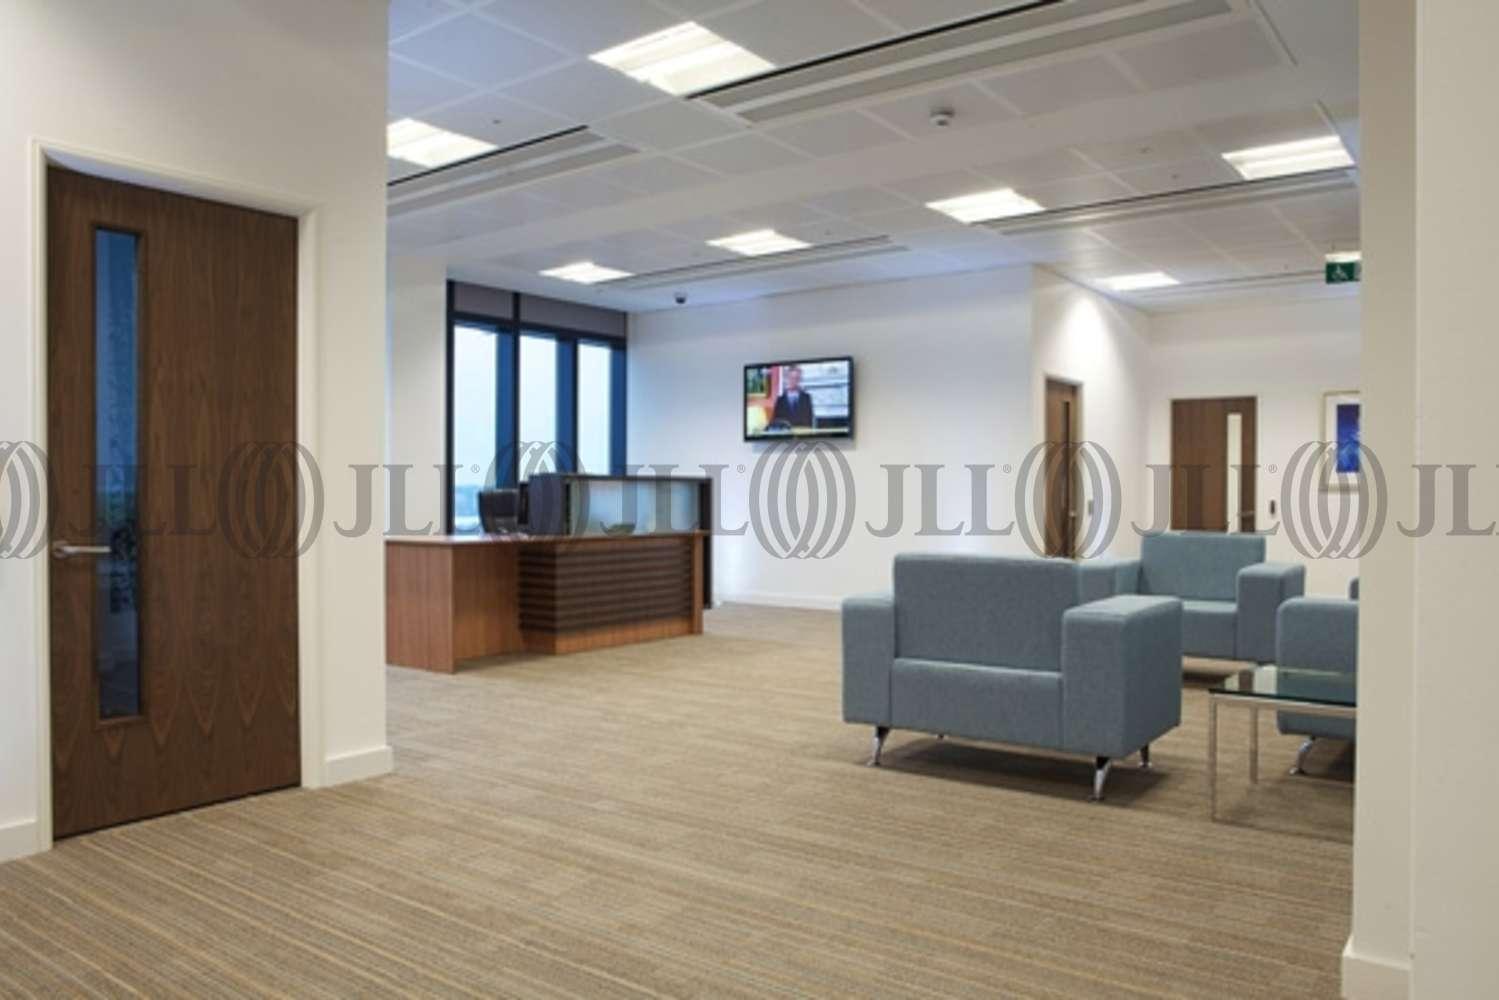 Serviced office London, SE10 0ER - 6 Mitre Passage